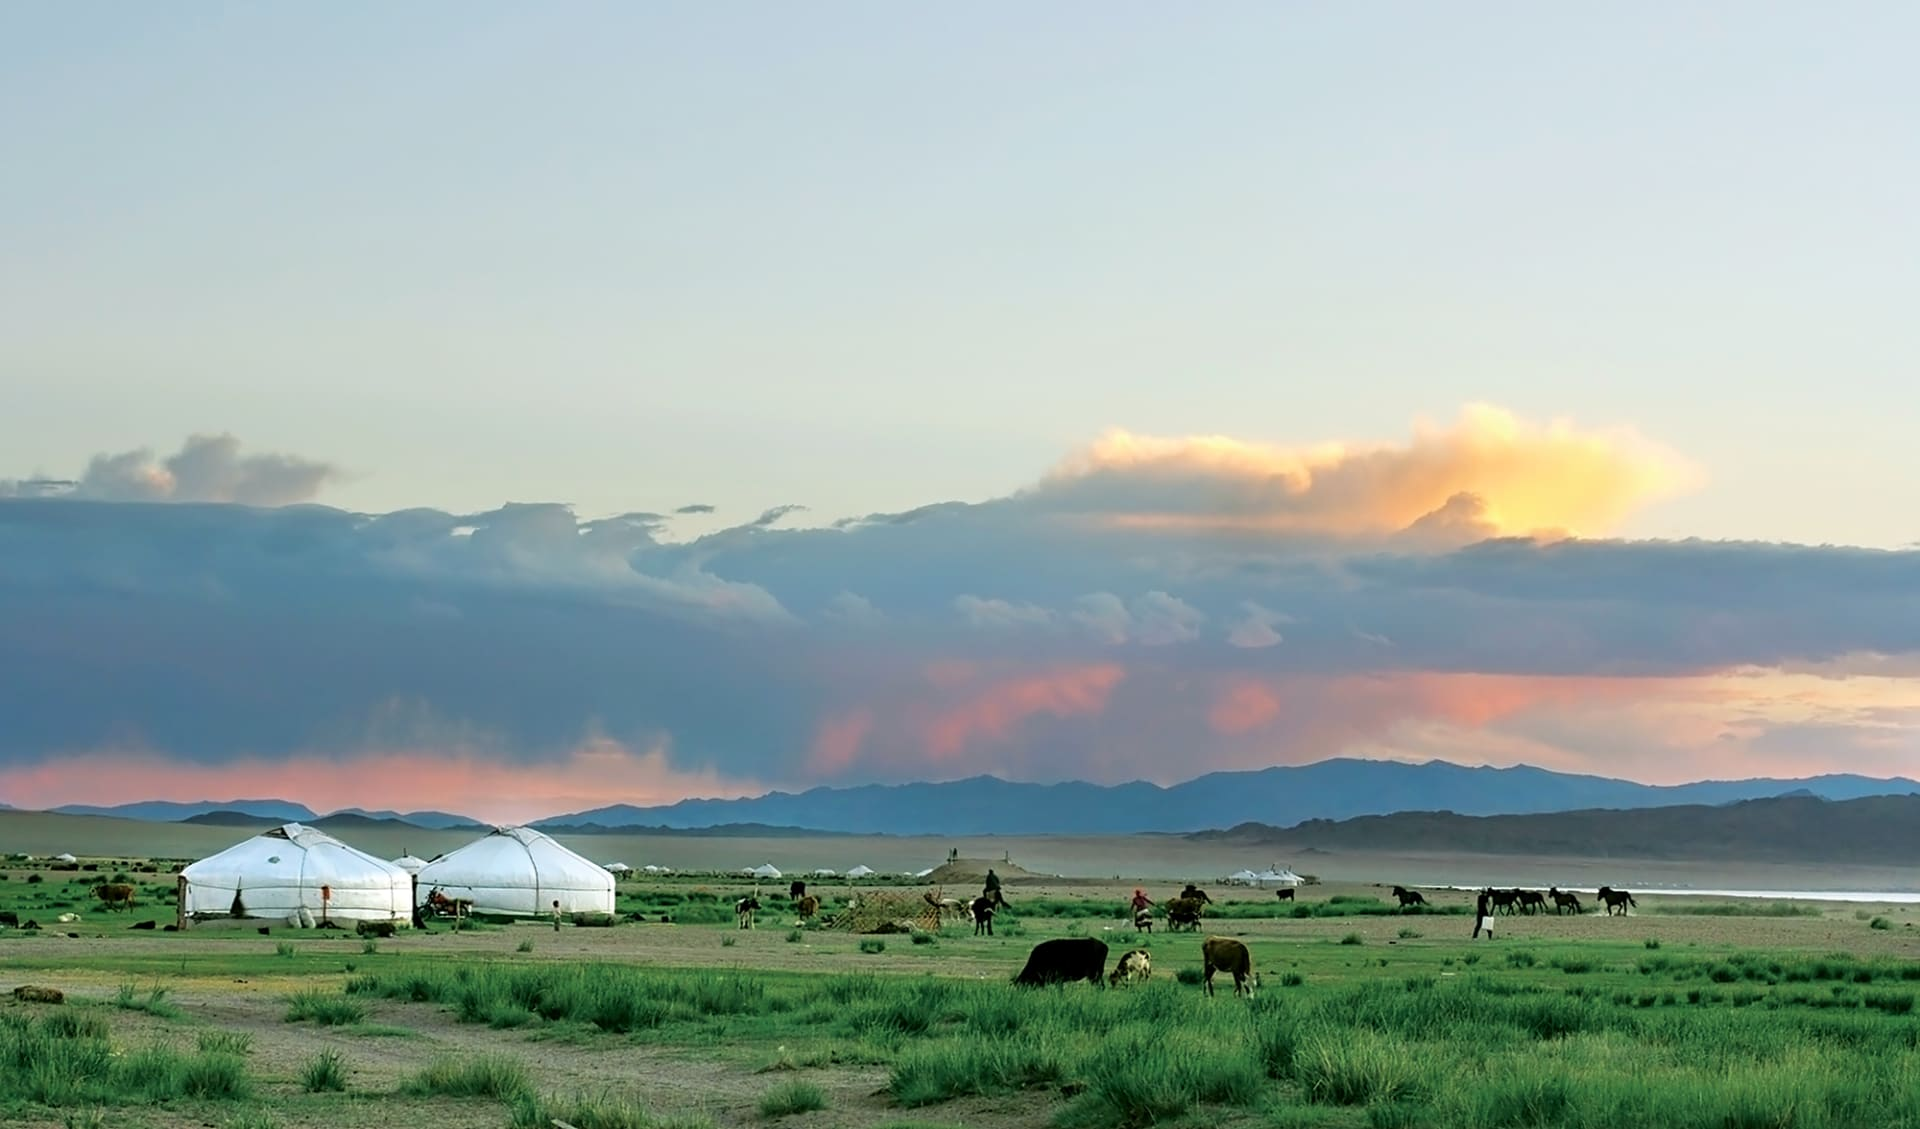 Hauptstadt des Dschingis Khan ab Ulaanbaatar: Mongolei_Grasland_